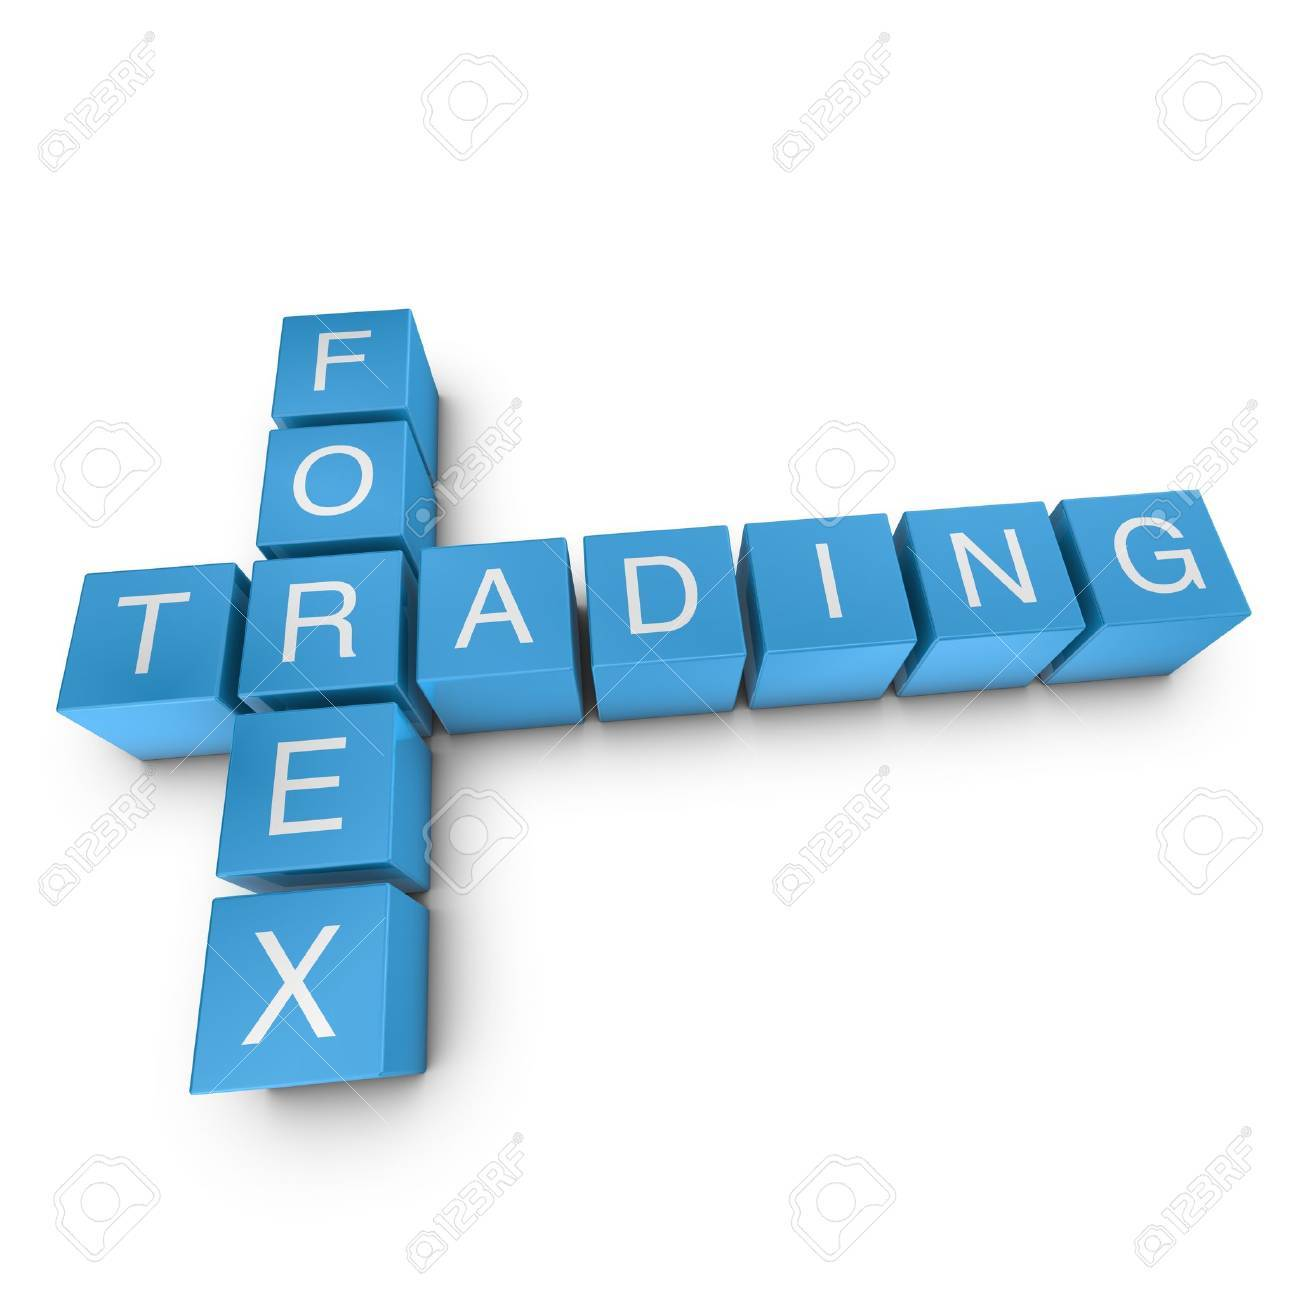 Edward & Sons Trading Company Coupon Code